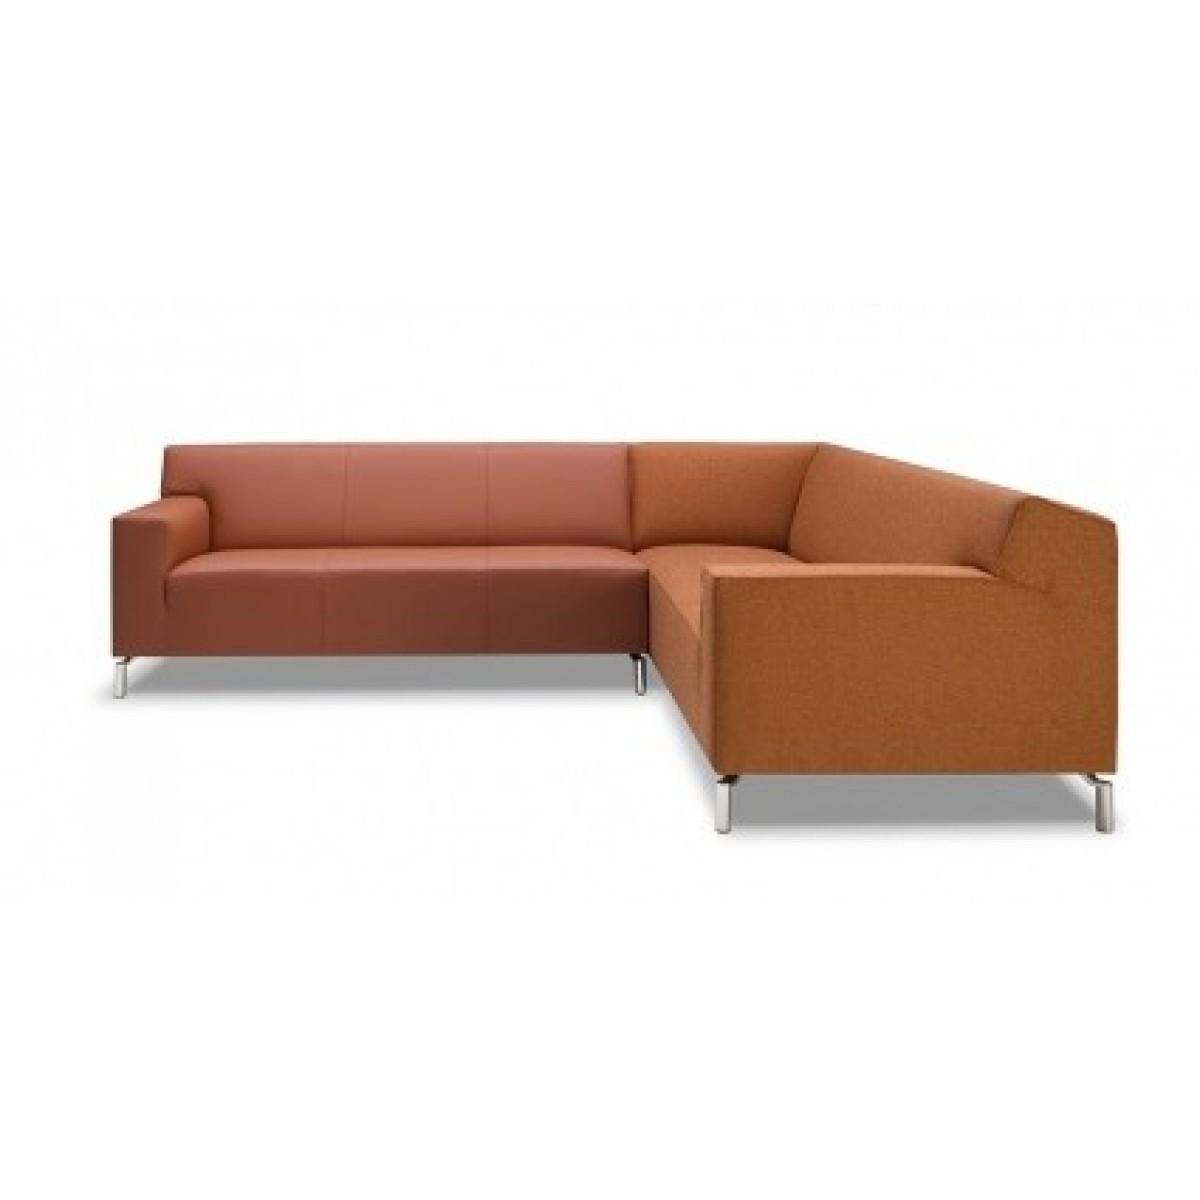 Suze-Hoekbank-jame-meubelen